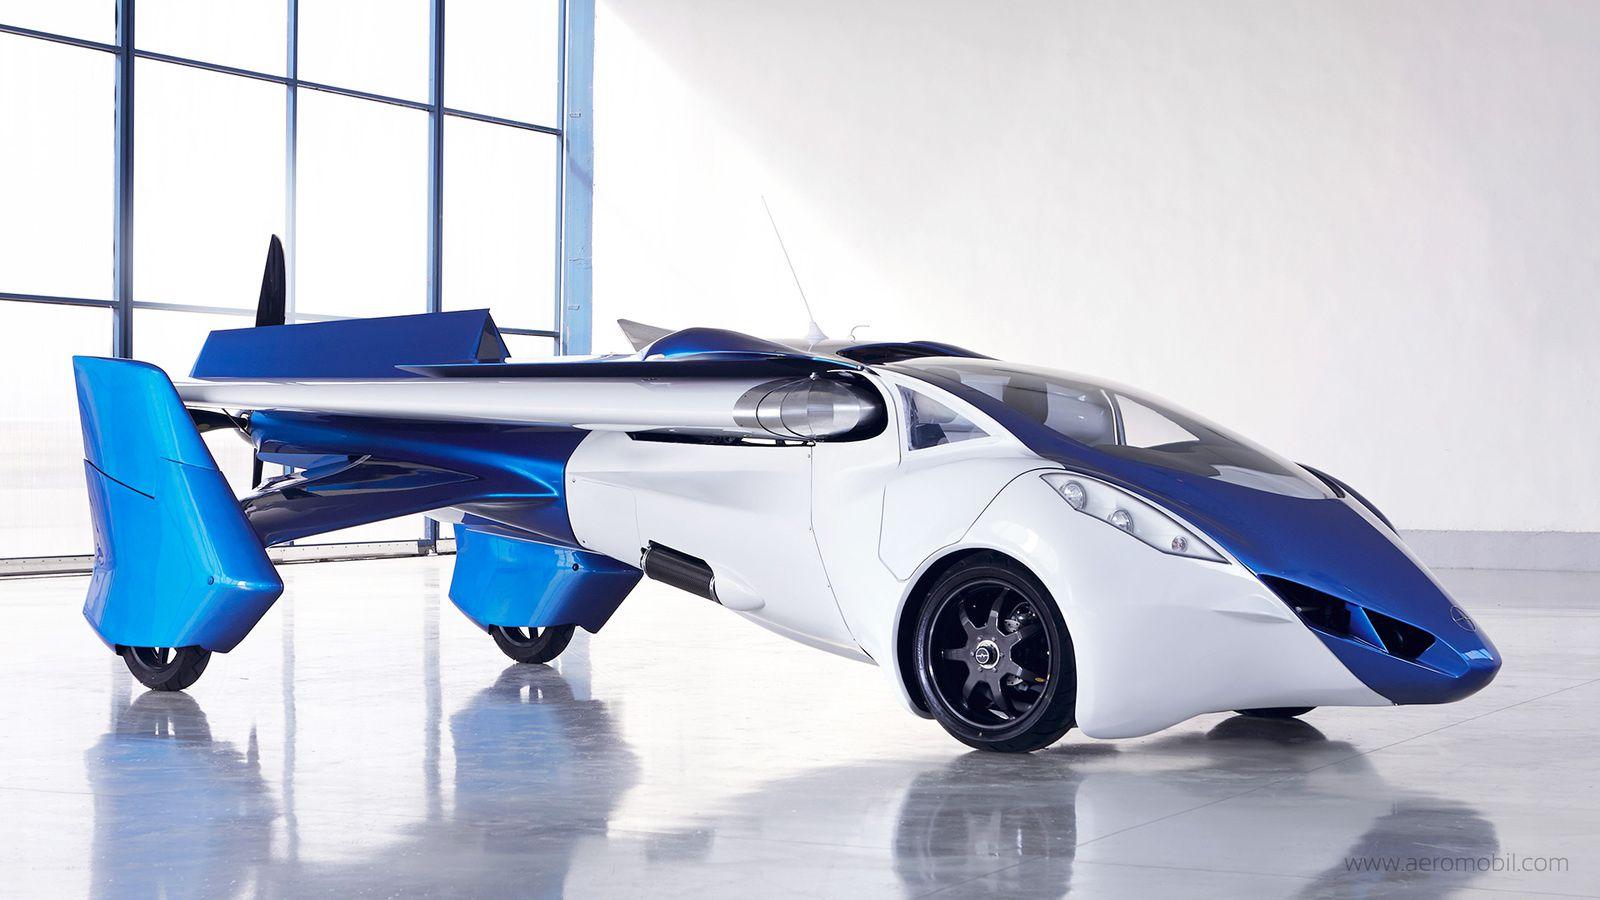 AeroMobil 3.0 : premier vol